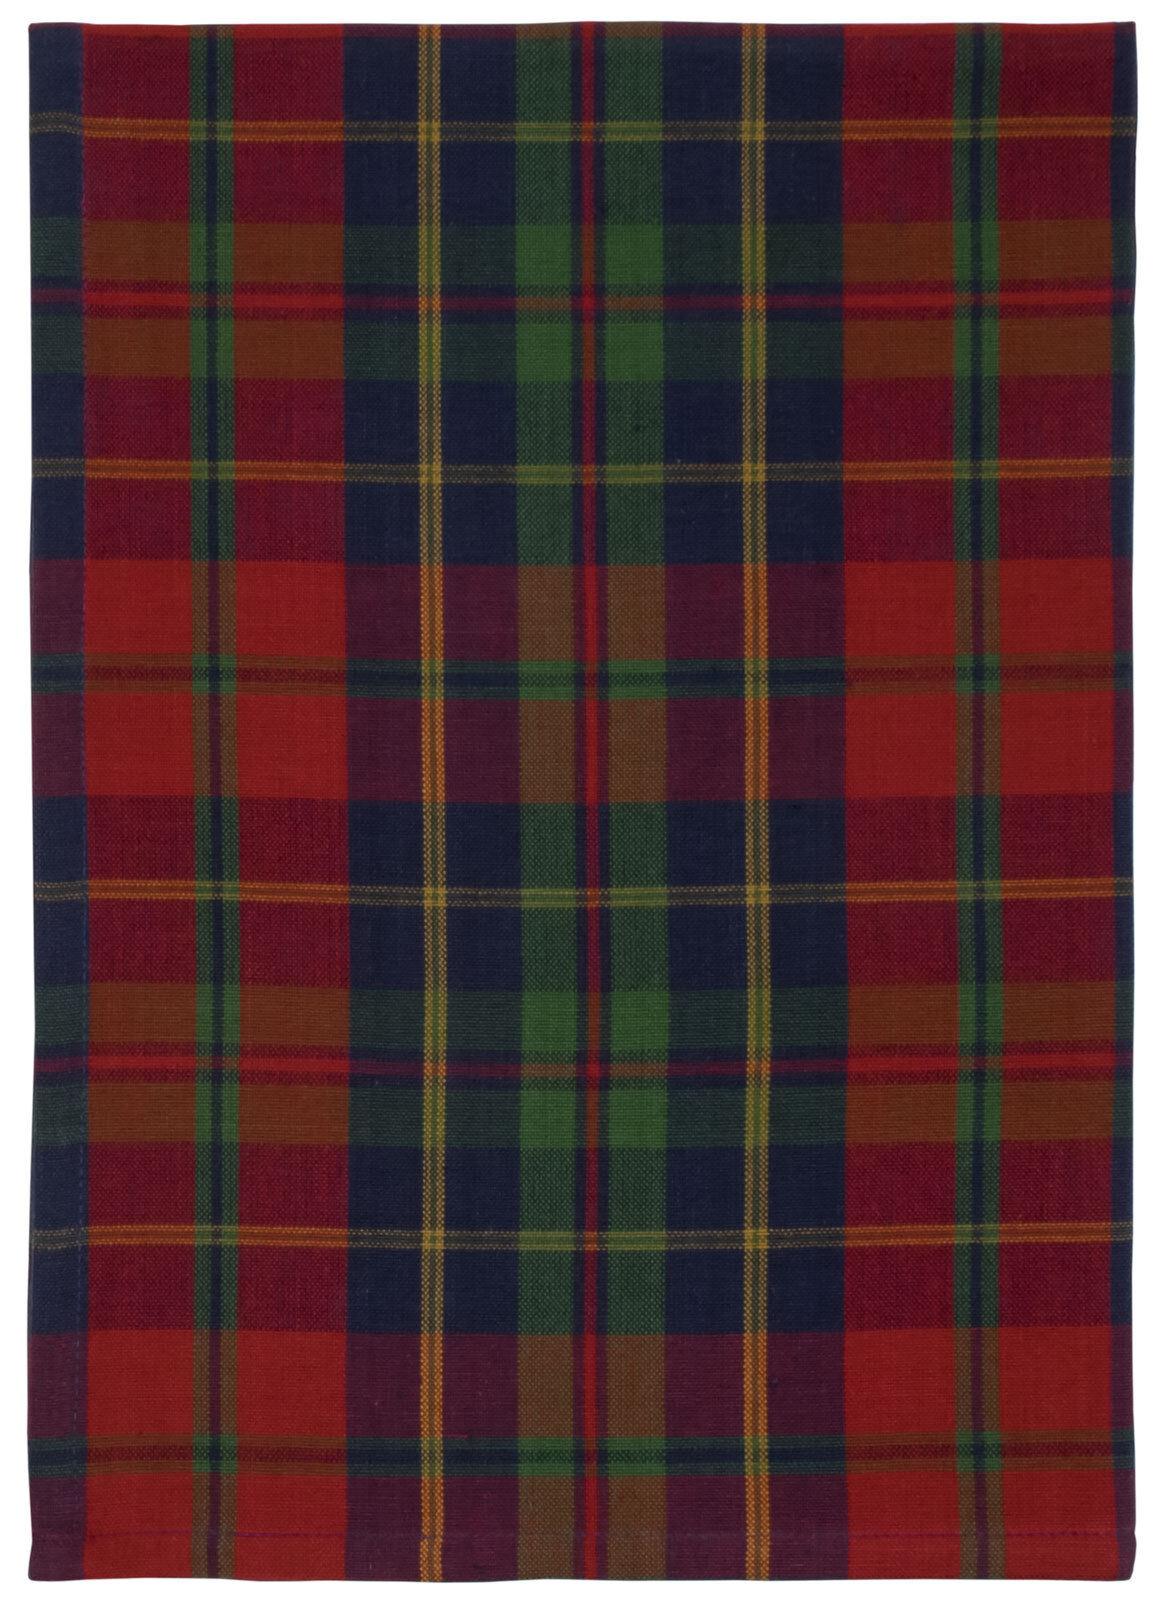 100% Cotton rot Blau & Grün Plaid 20 x28  Dish Towel, Set of 6 - Marlow